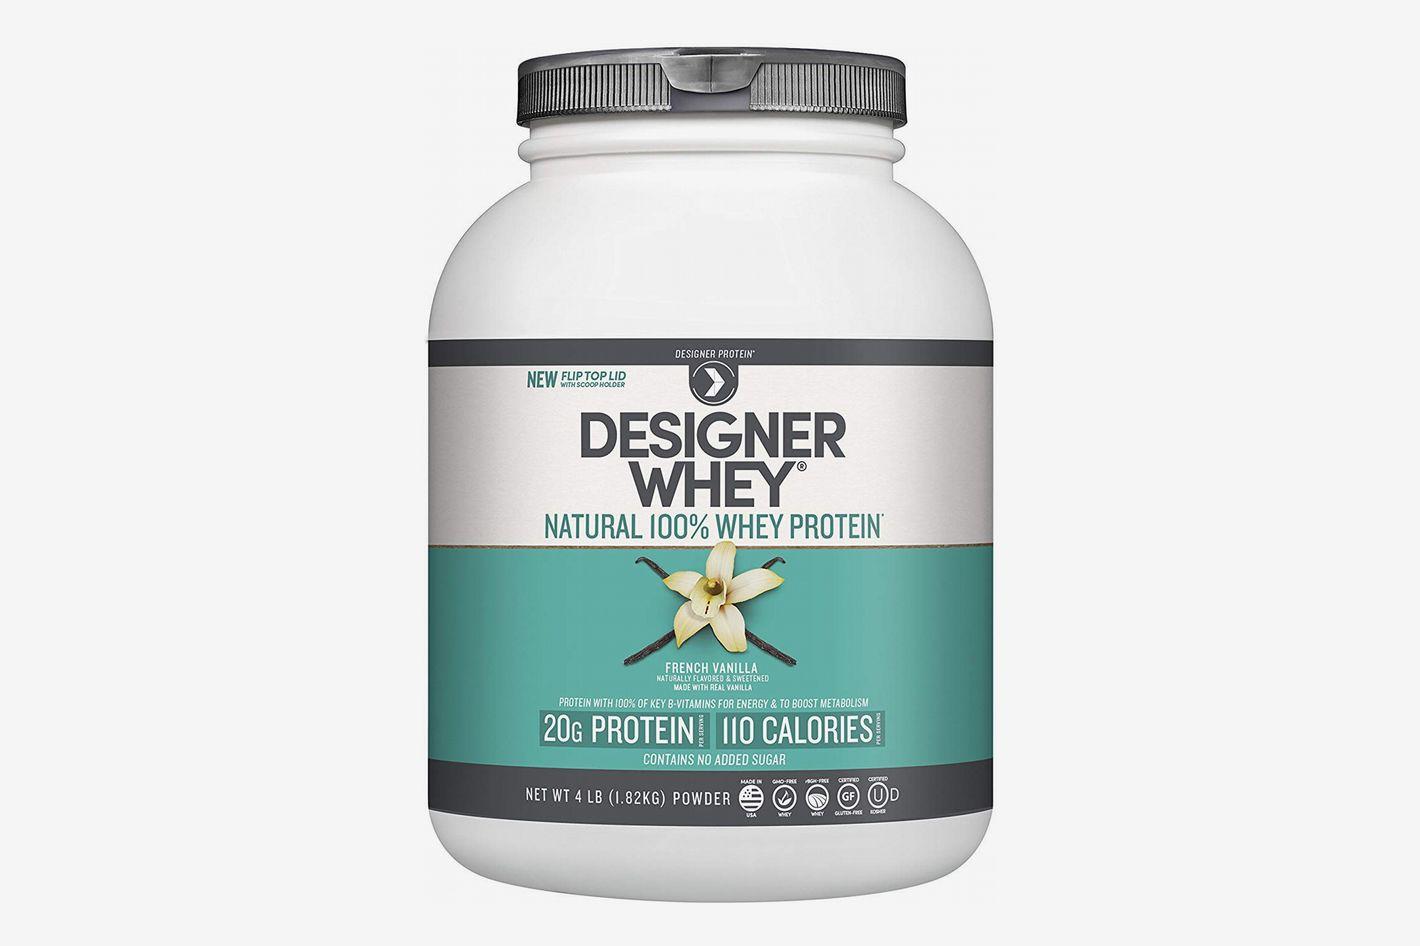 Designer Whey Premium Natural 100% Whey Protein, French Vanilla